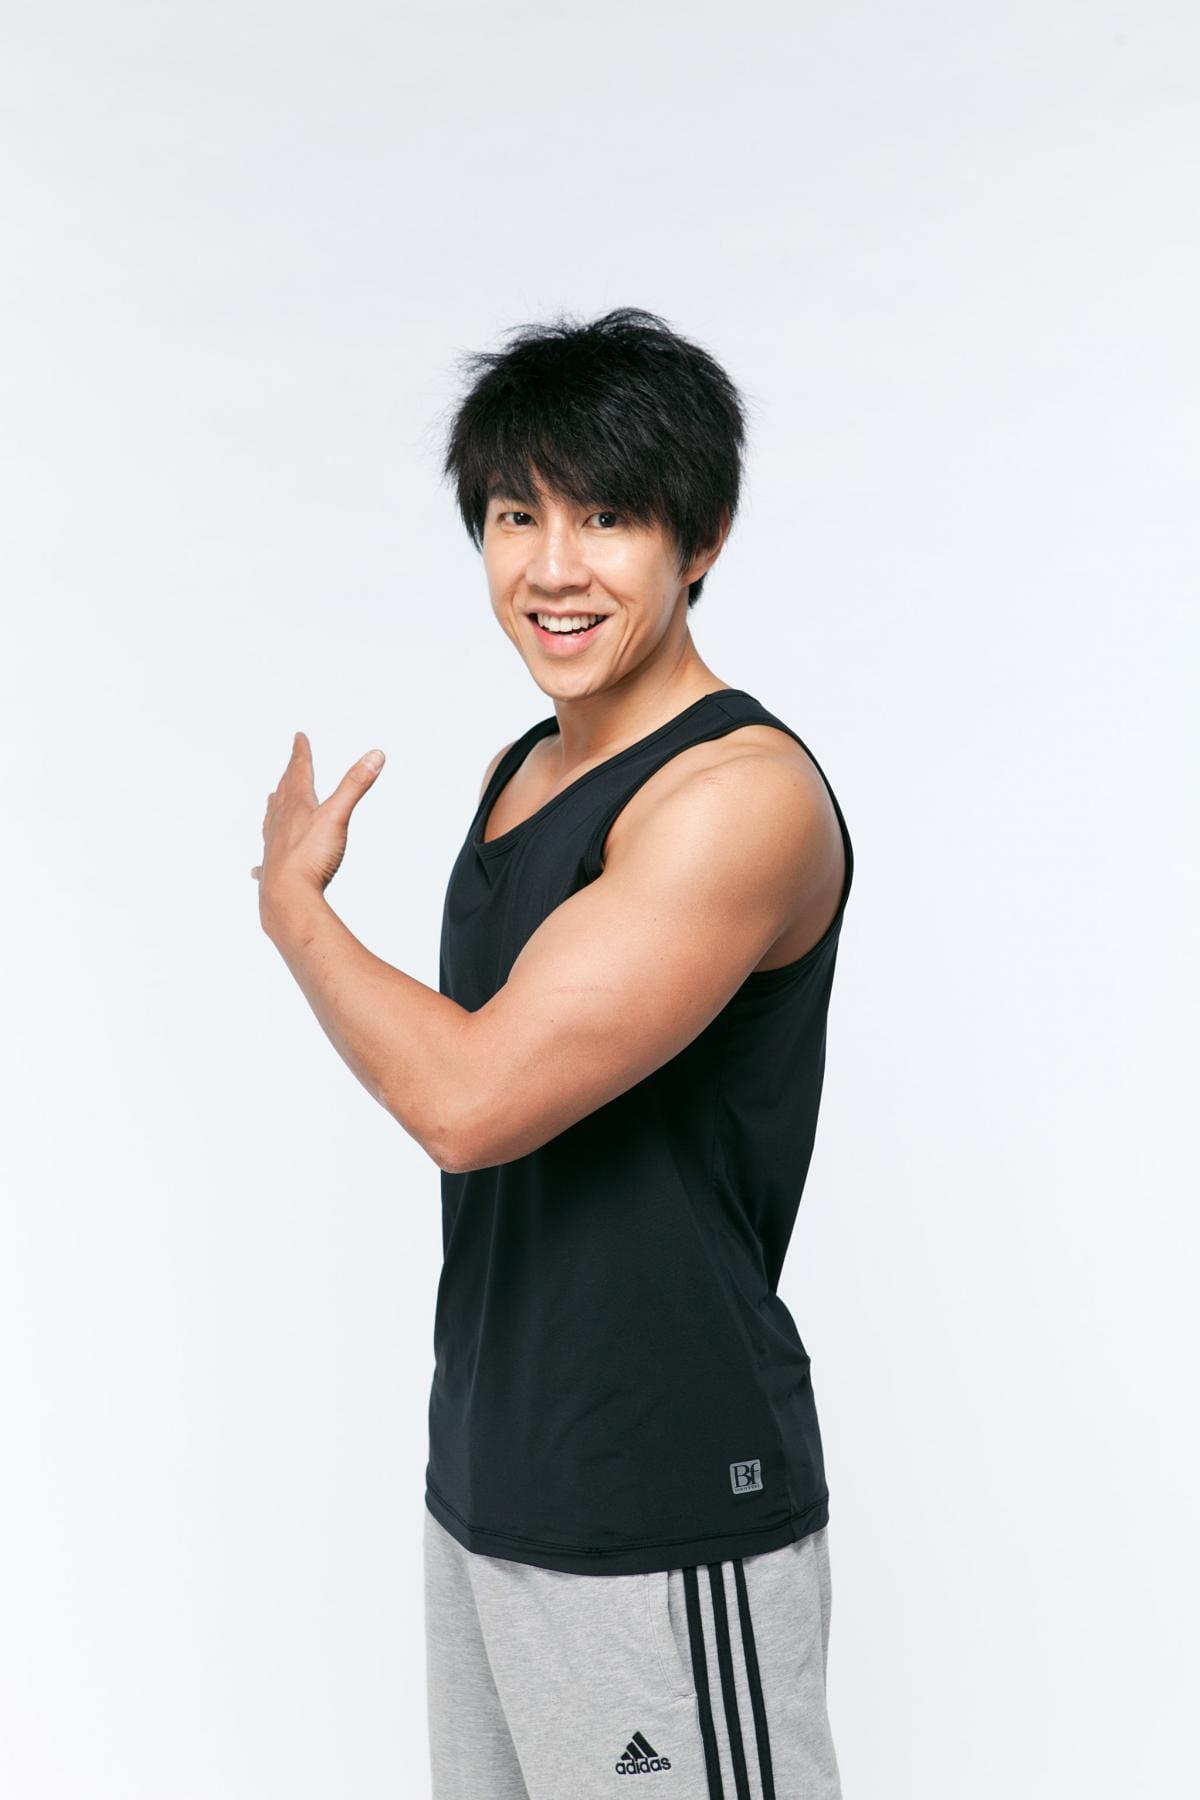 【BODYFEEL】体感服飾-夏季男款涼感抗UV坦克背心 3